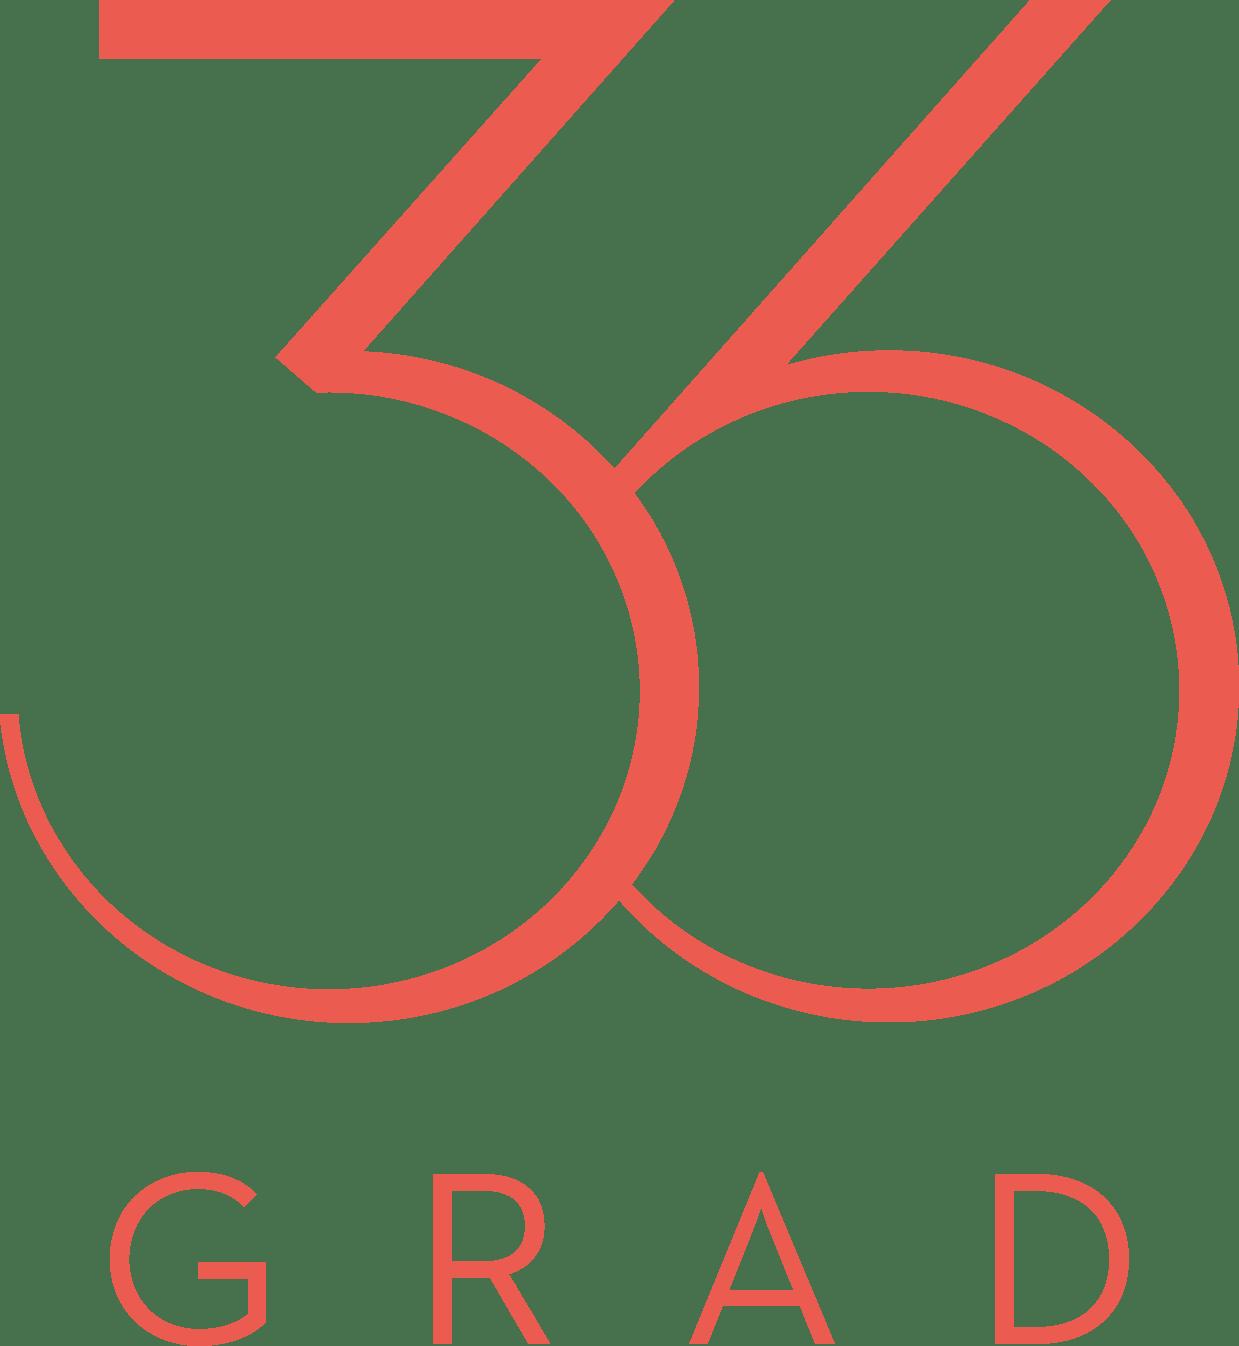 36GRAD - Swissmade SpaCulture